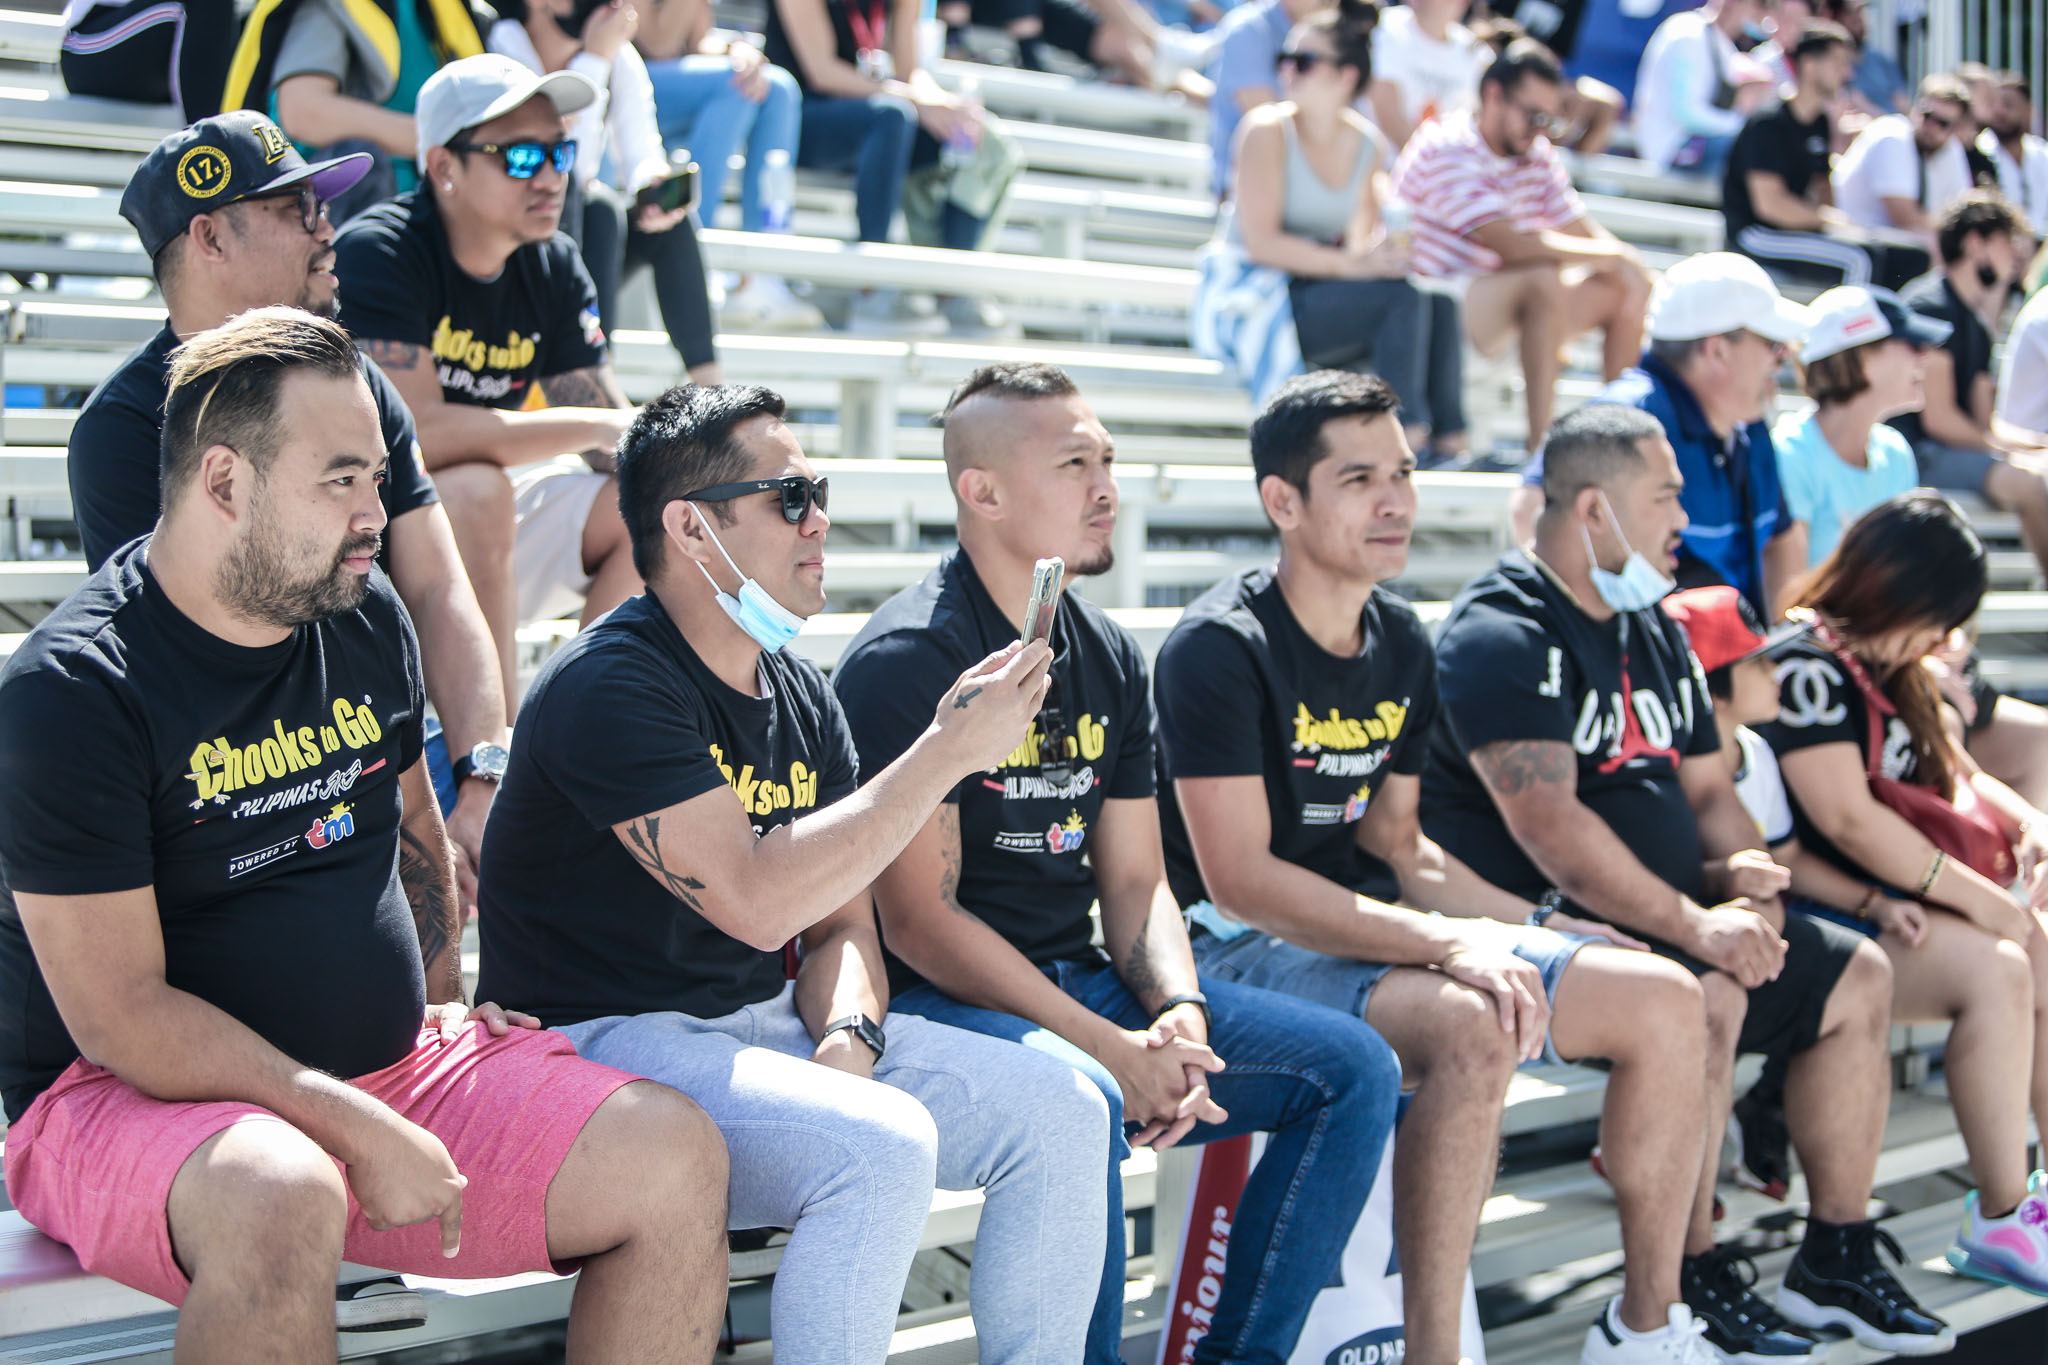 2021-FIBA-3x3-Montreal-WT-Antwerp-def-Manila-Chooks-fans Manila Chooks sent to brink by Antwerp in FIBA 3x3 Montreal WT 3x3 Basketball Chooks-to-Go Pilipinas 3x3 News  - philippine sports news